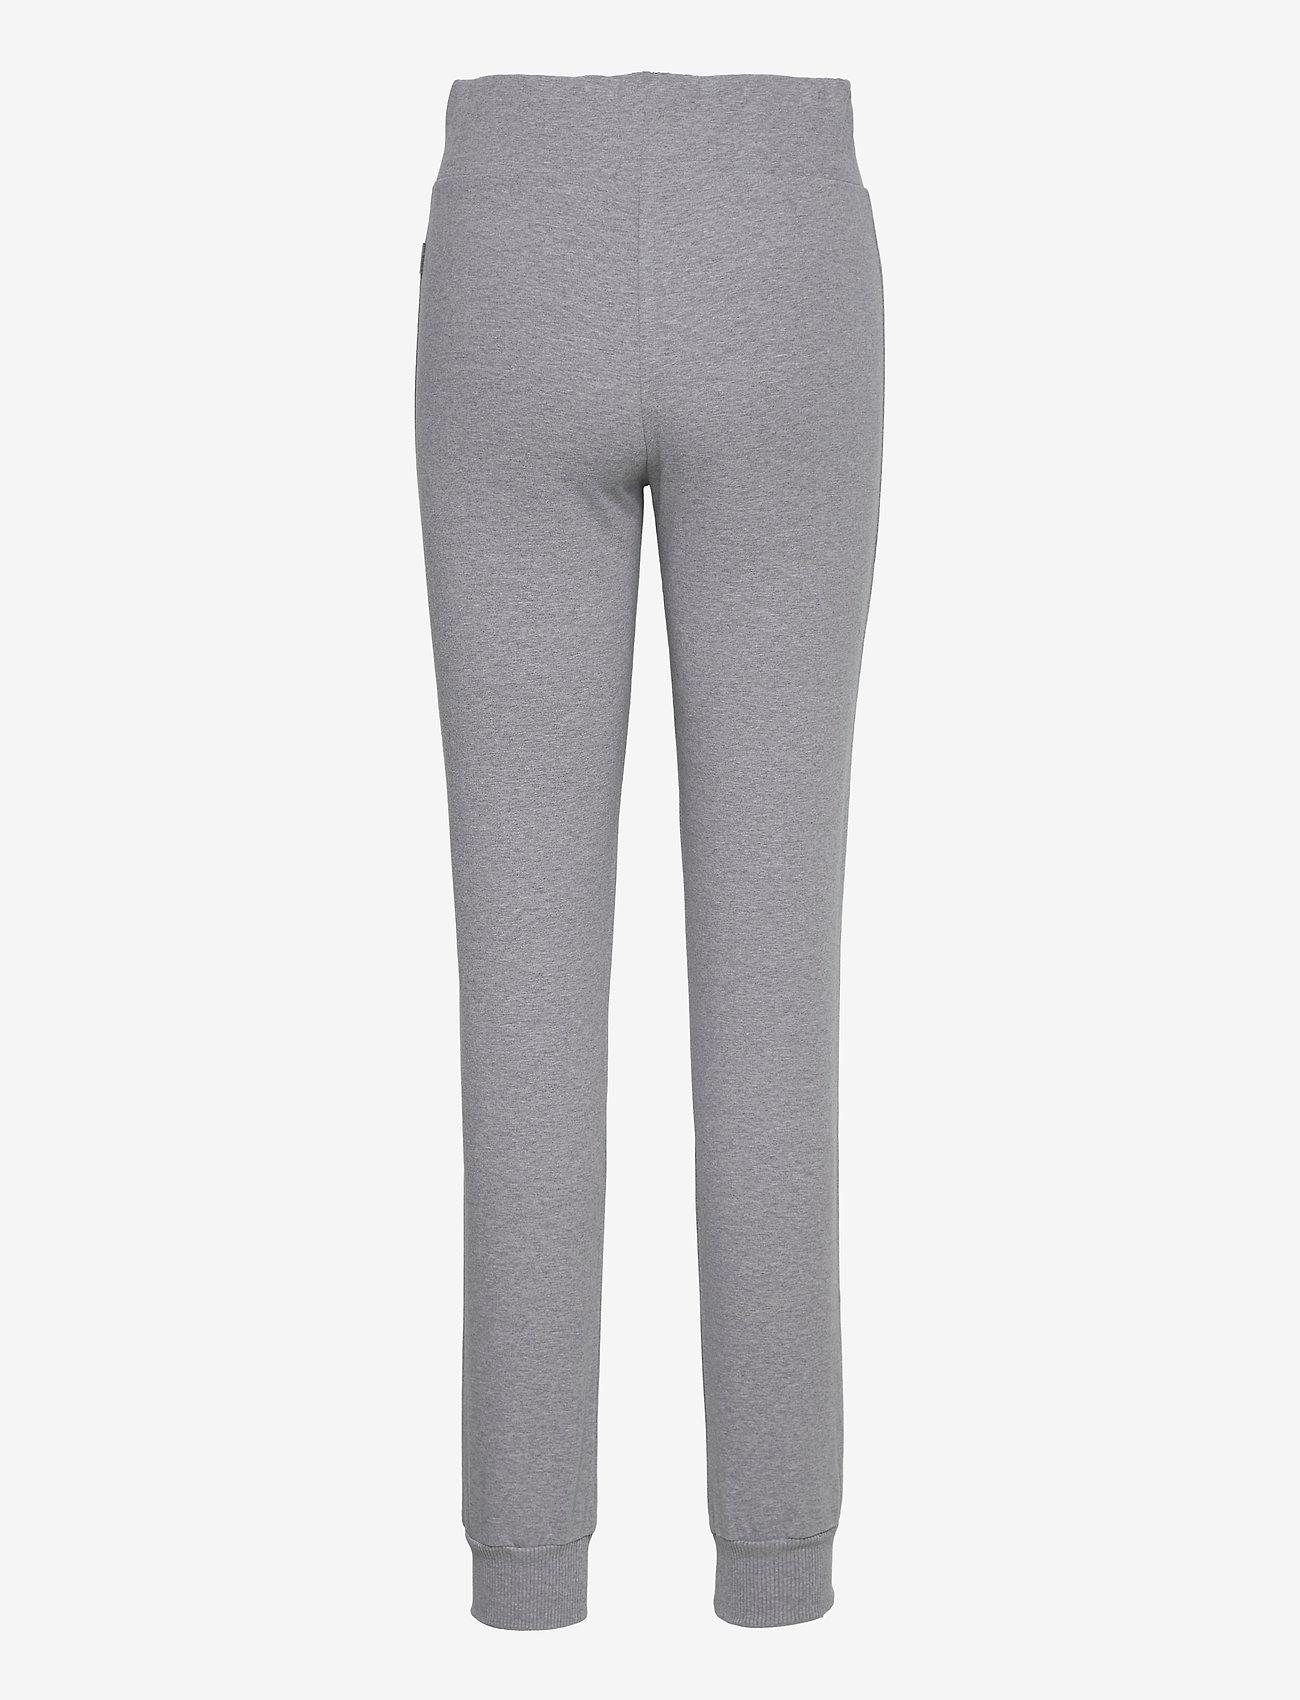 ella&il - Bibbi pants - vêtements - grey - 1